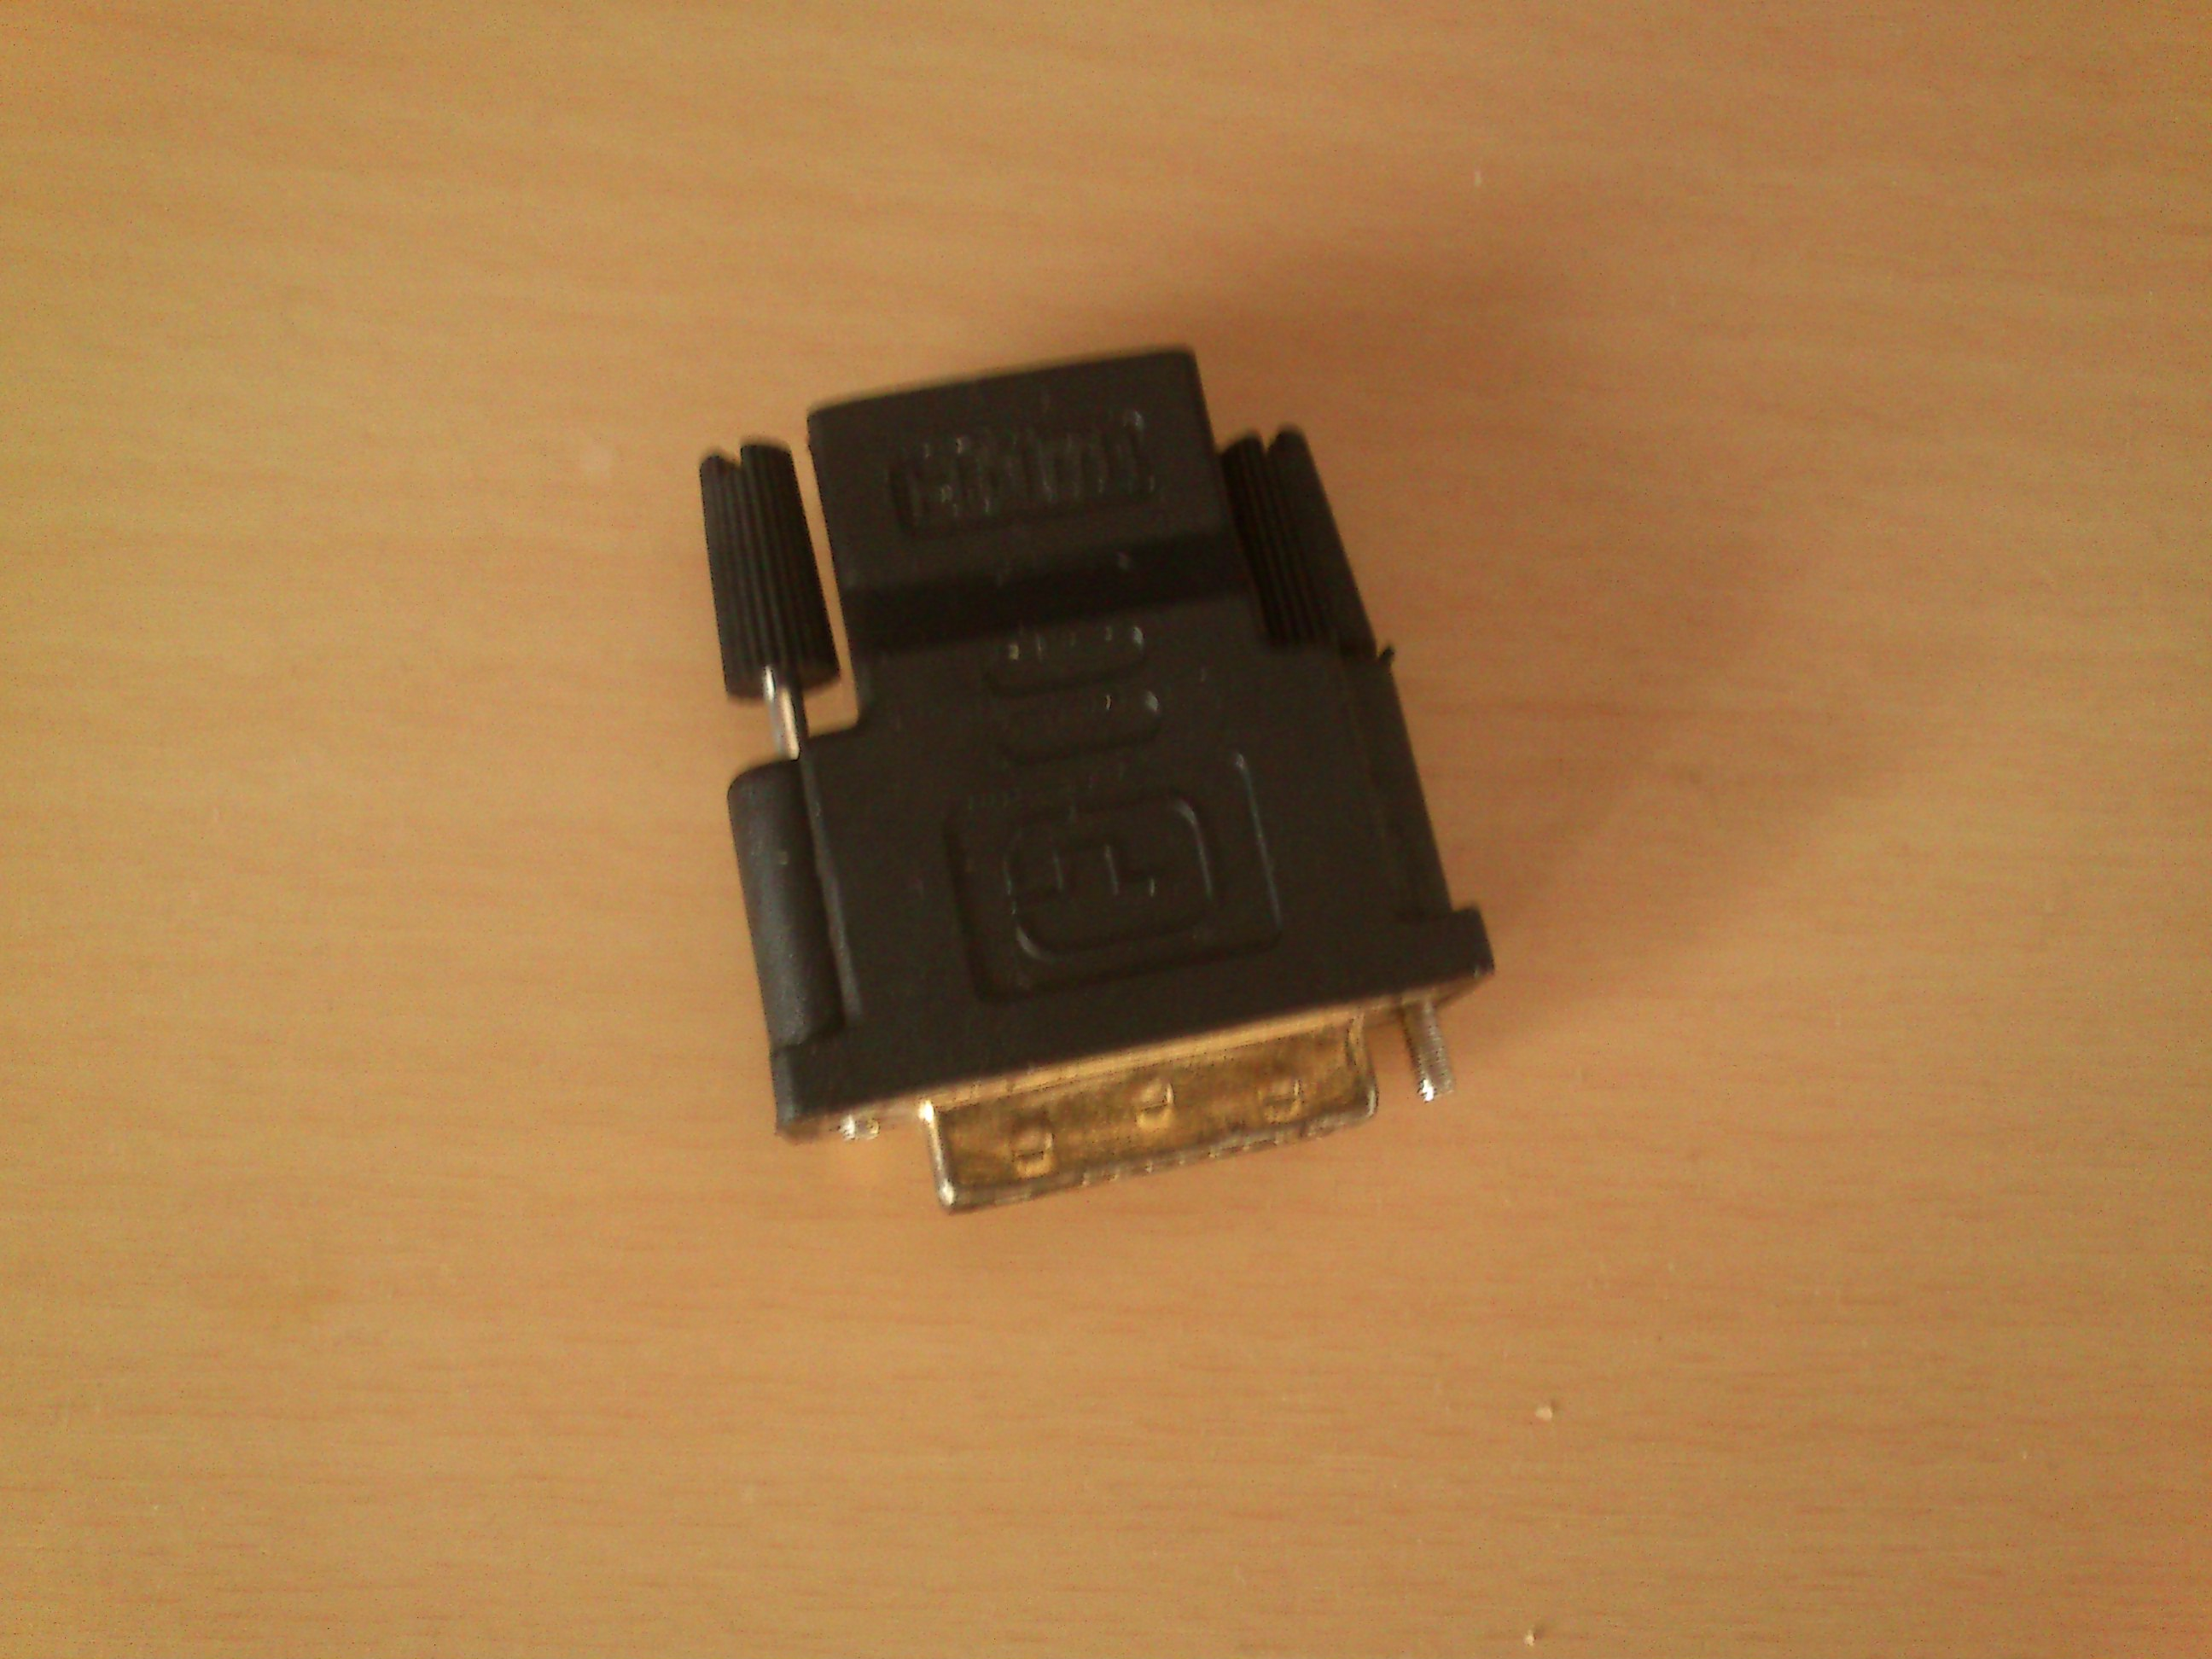 HP2310ei - Monitor gubi sygna� z tunera dvb-t